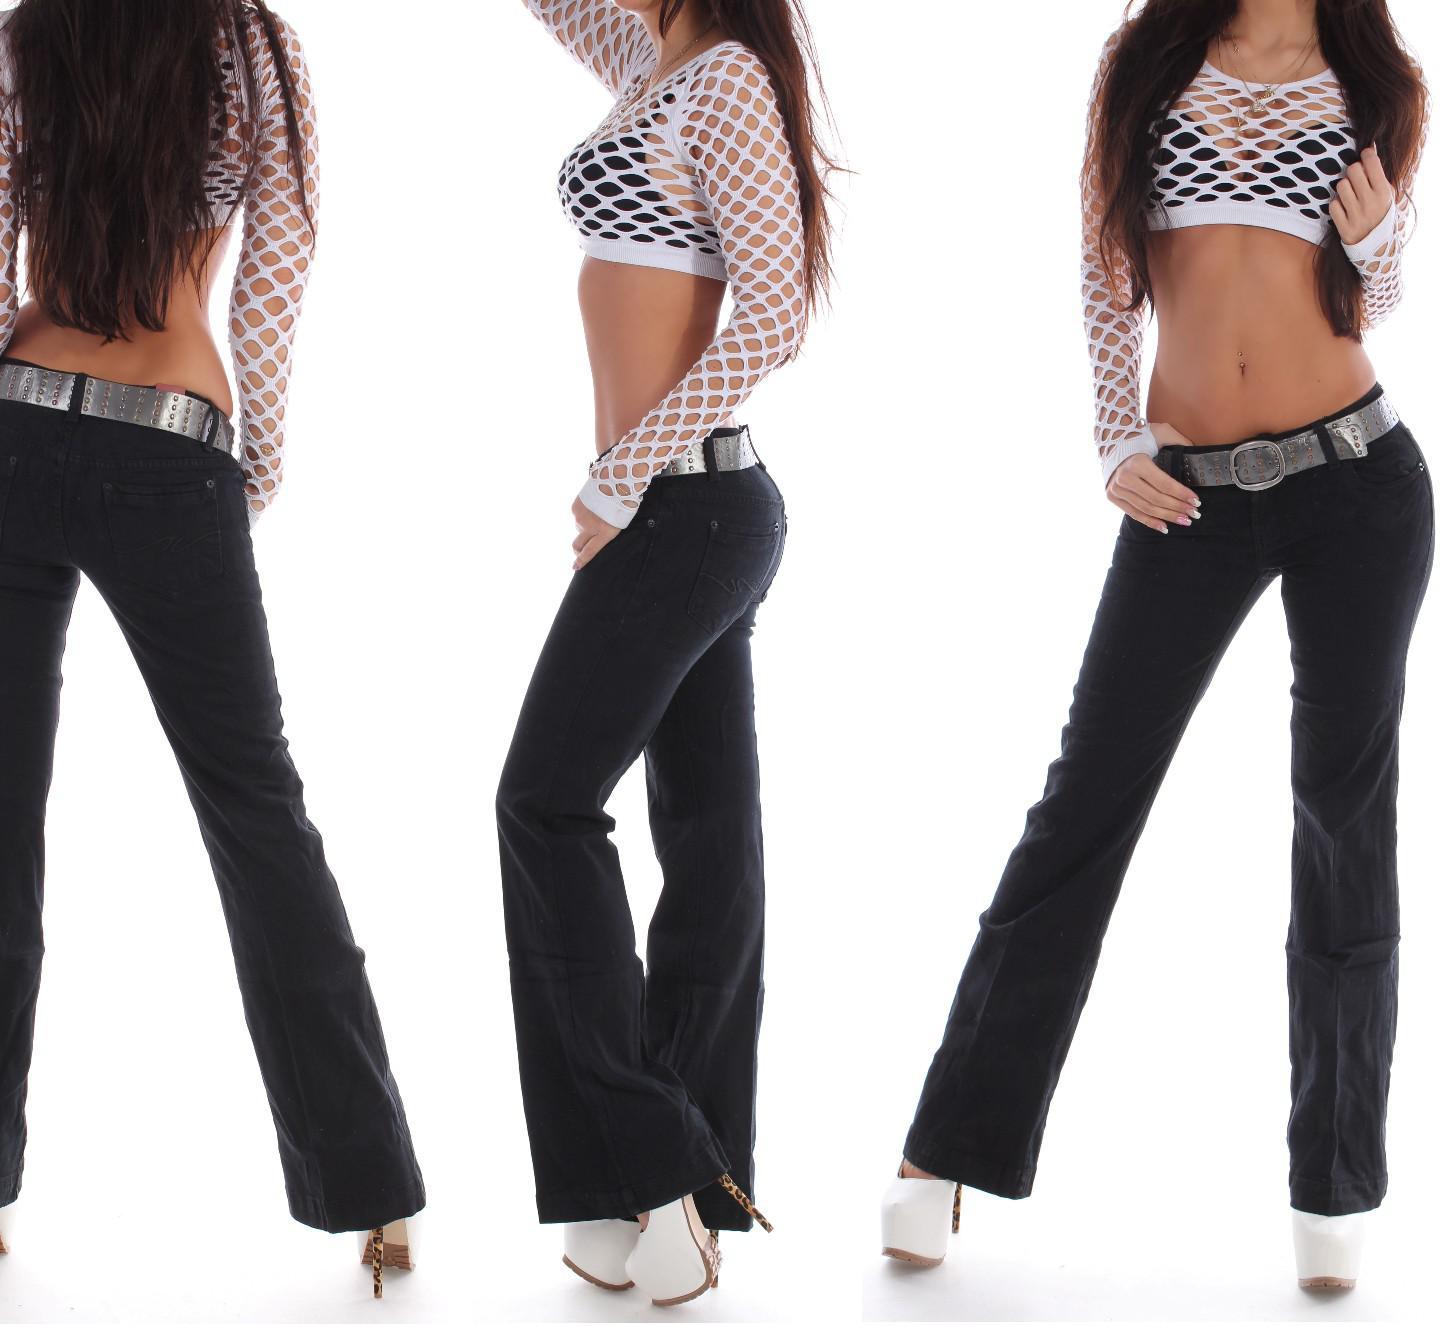 damen bootcut jeans schlag hose h ftjeans schwarz g rtel sexy damenjeans s55 ebay. Black Bedroom Furniture Sets. Home Design Ideas